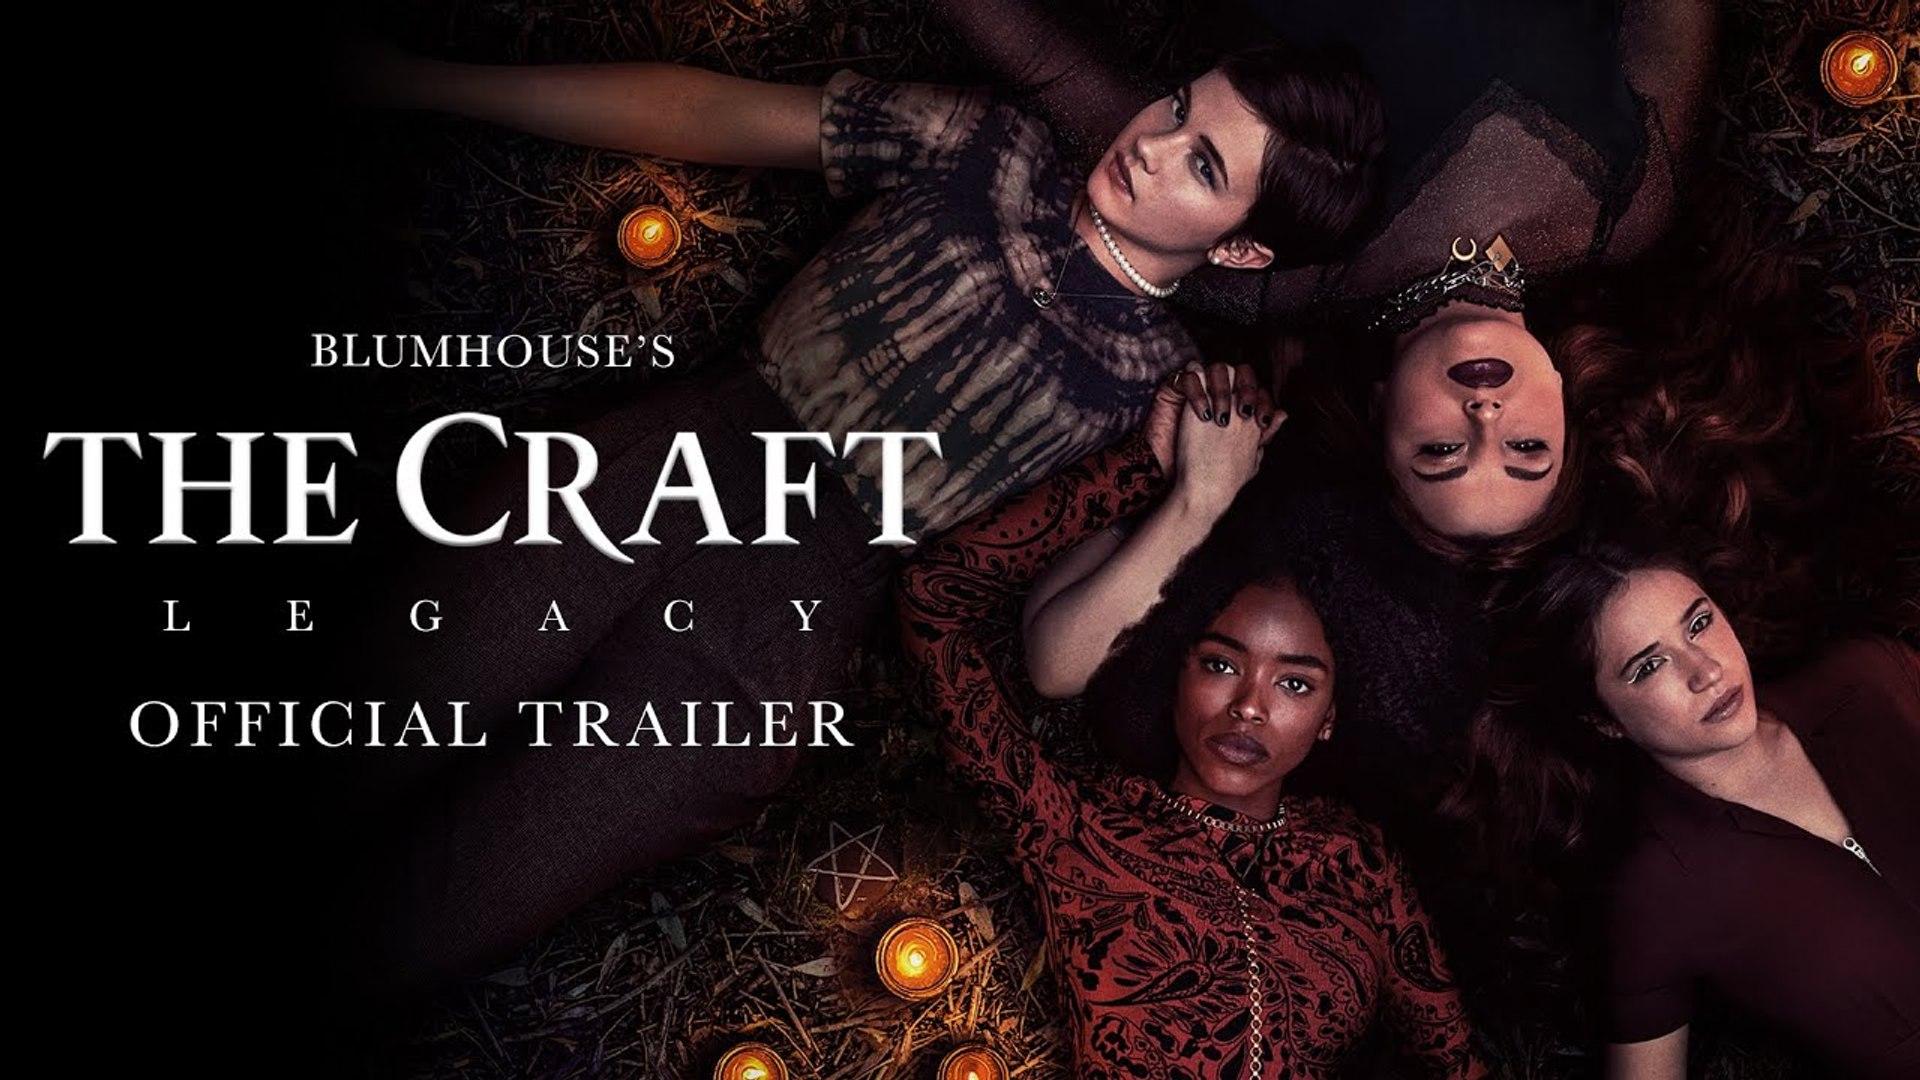 the craft 2 legacy trailer 2020 david duchovny blumhouse movie